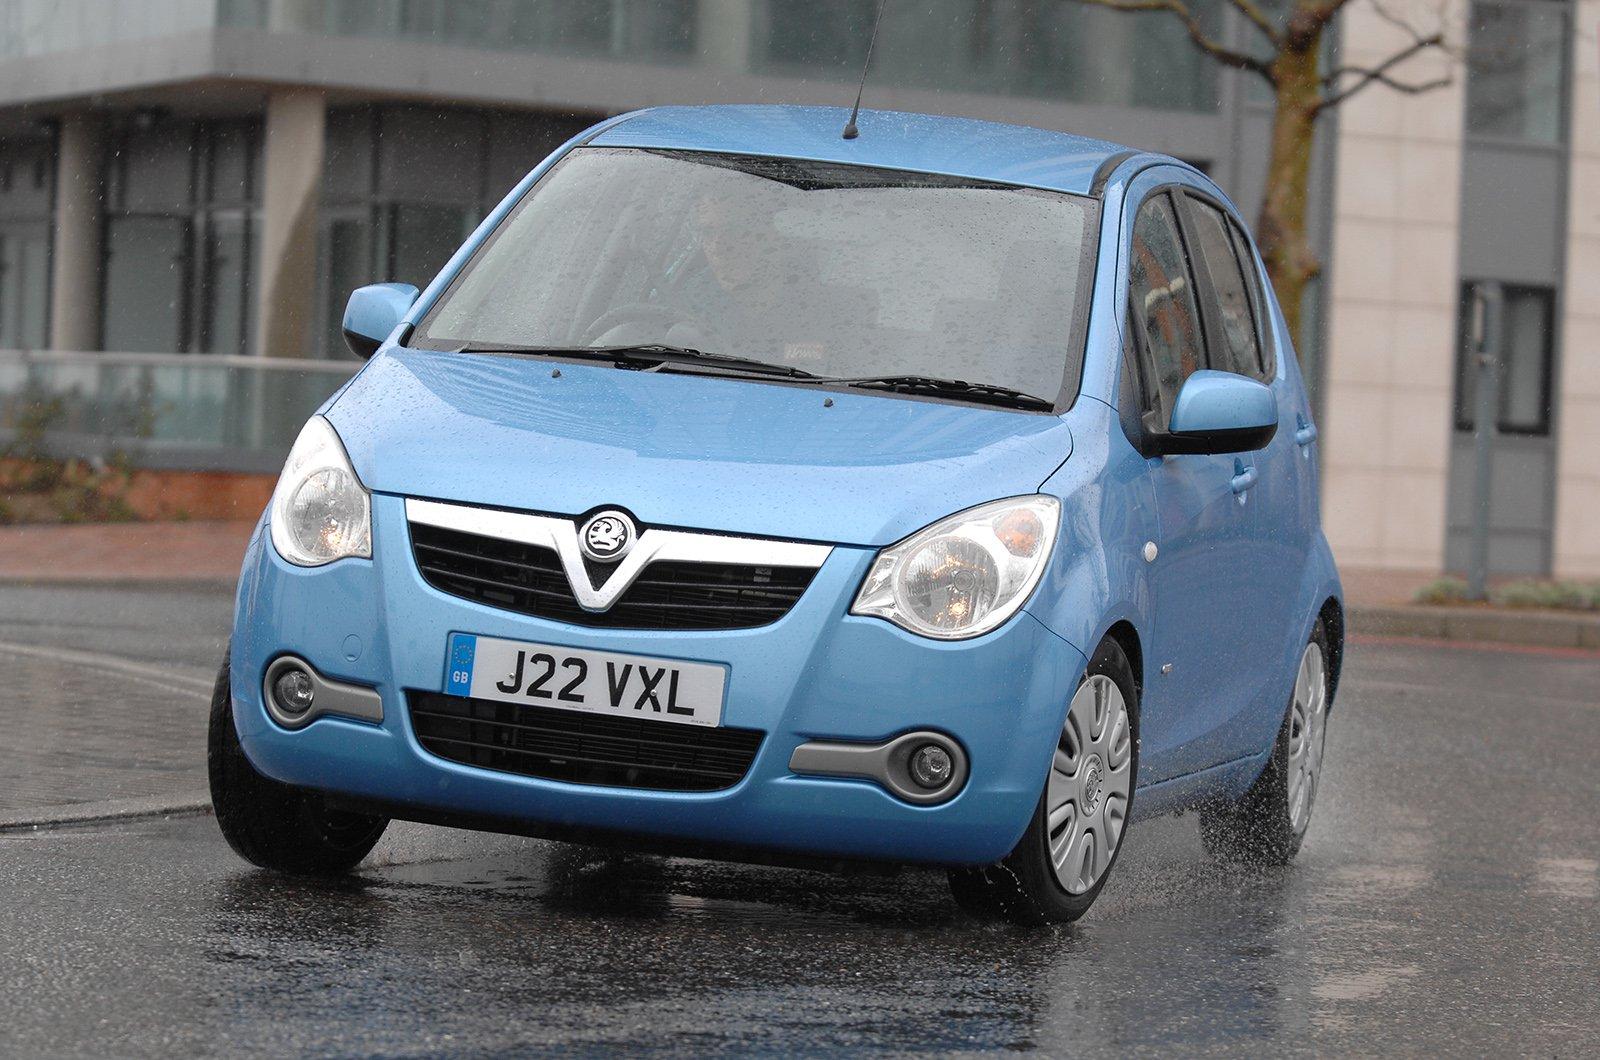 Vauxhall Agila 2008-2013